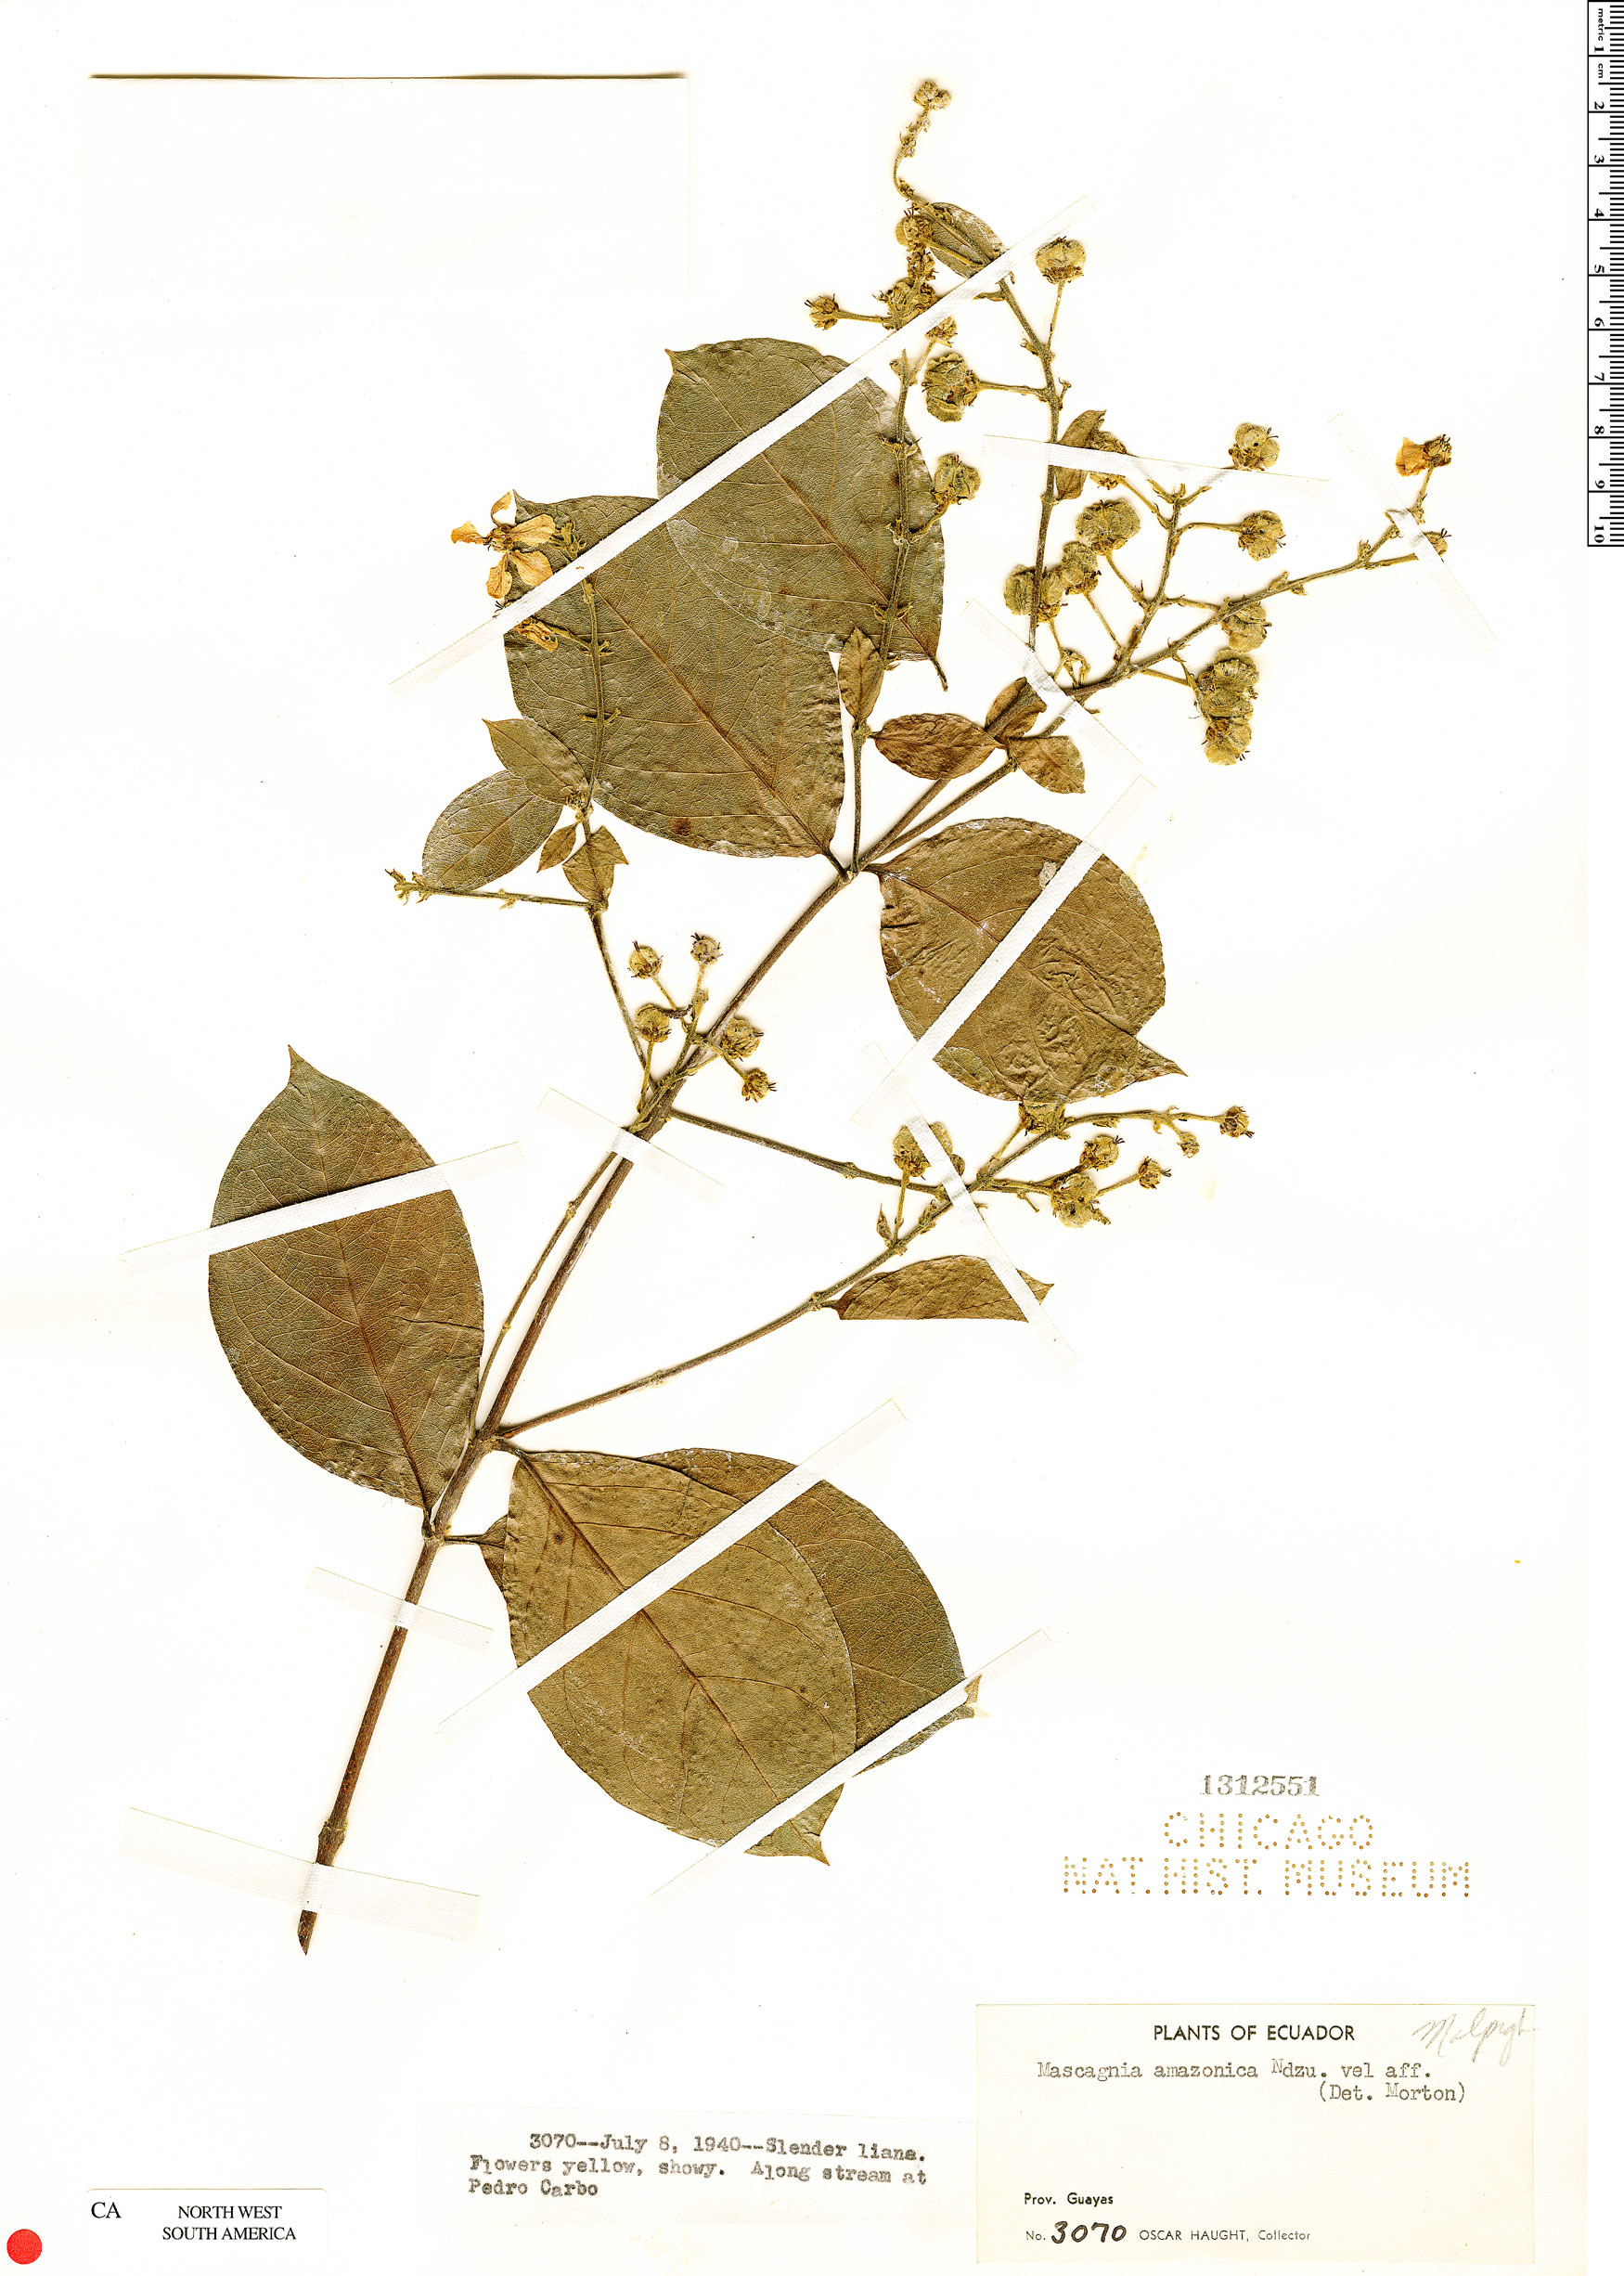 Espécime: Amorimia kariniana